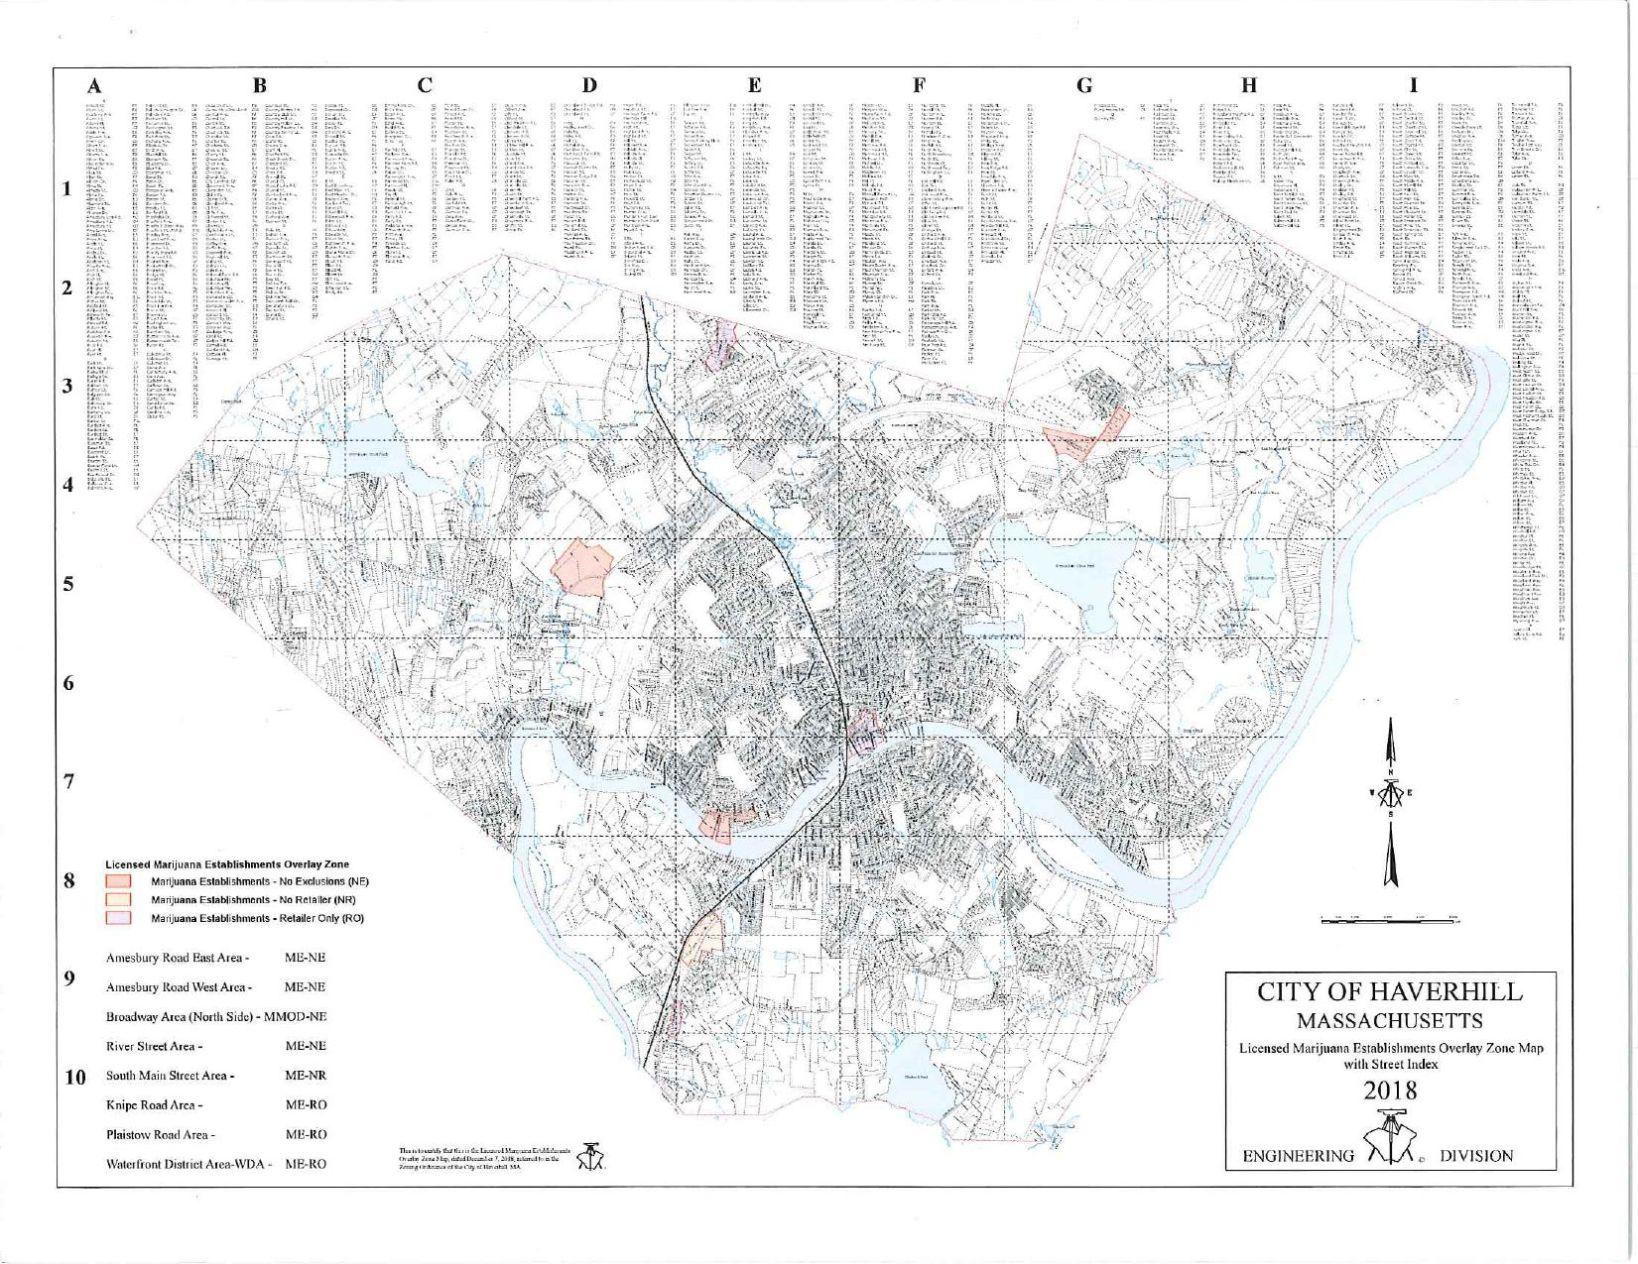 Methuen Ma Zip Code Map.City Of Methuen Zoning Map Creativehobby Store